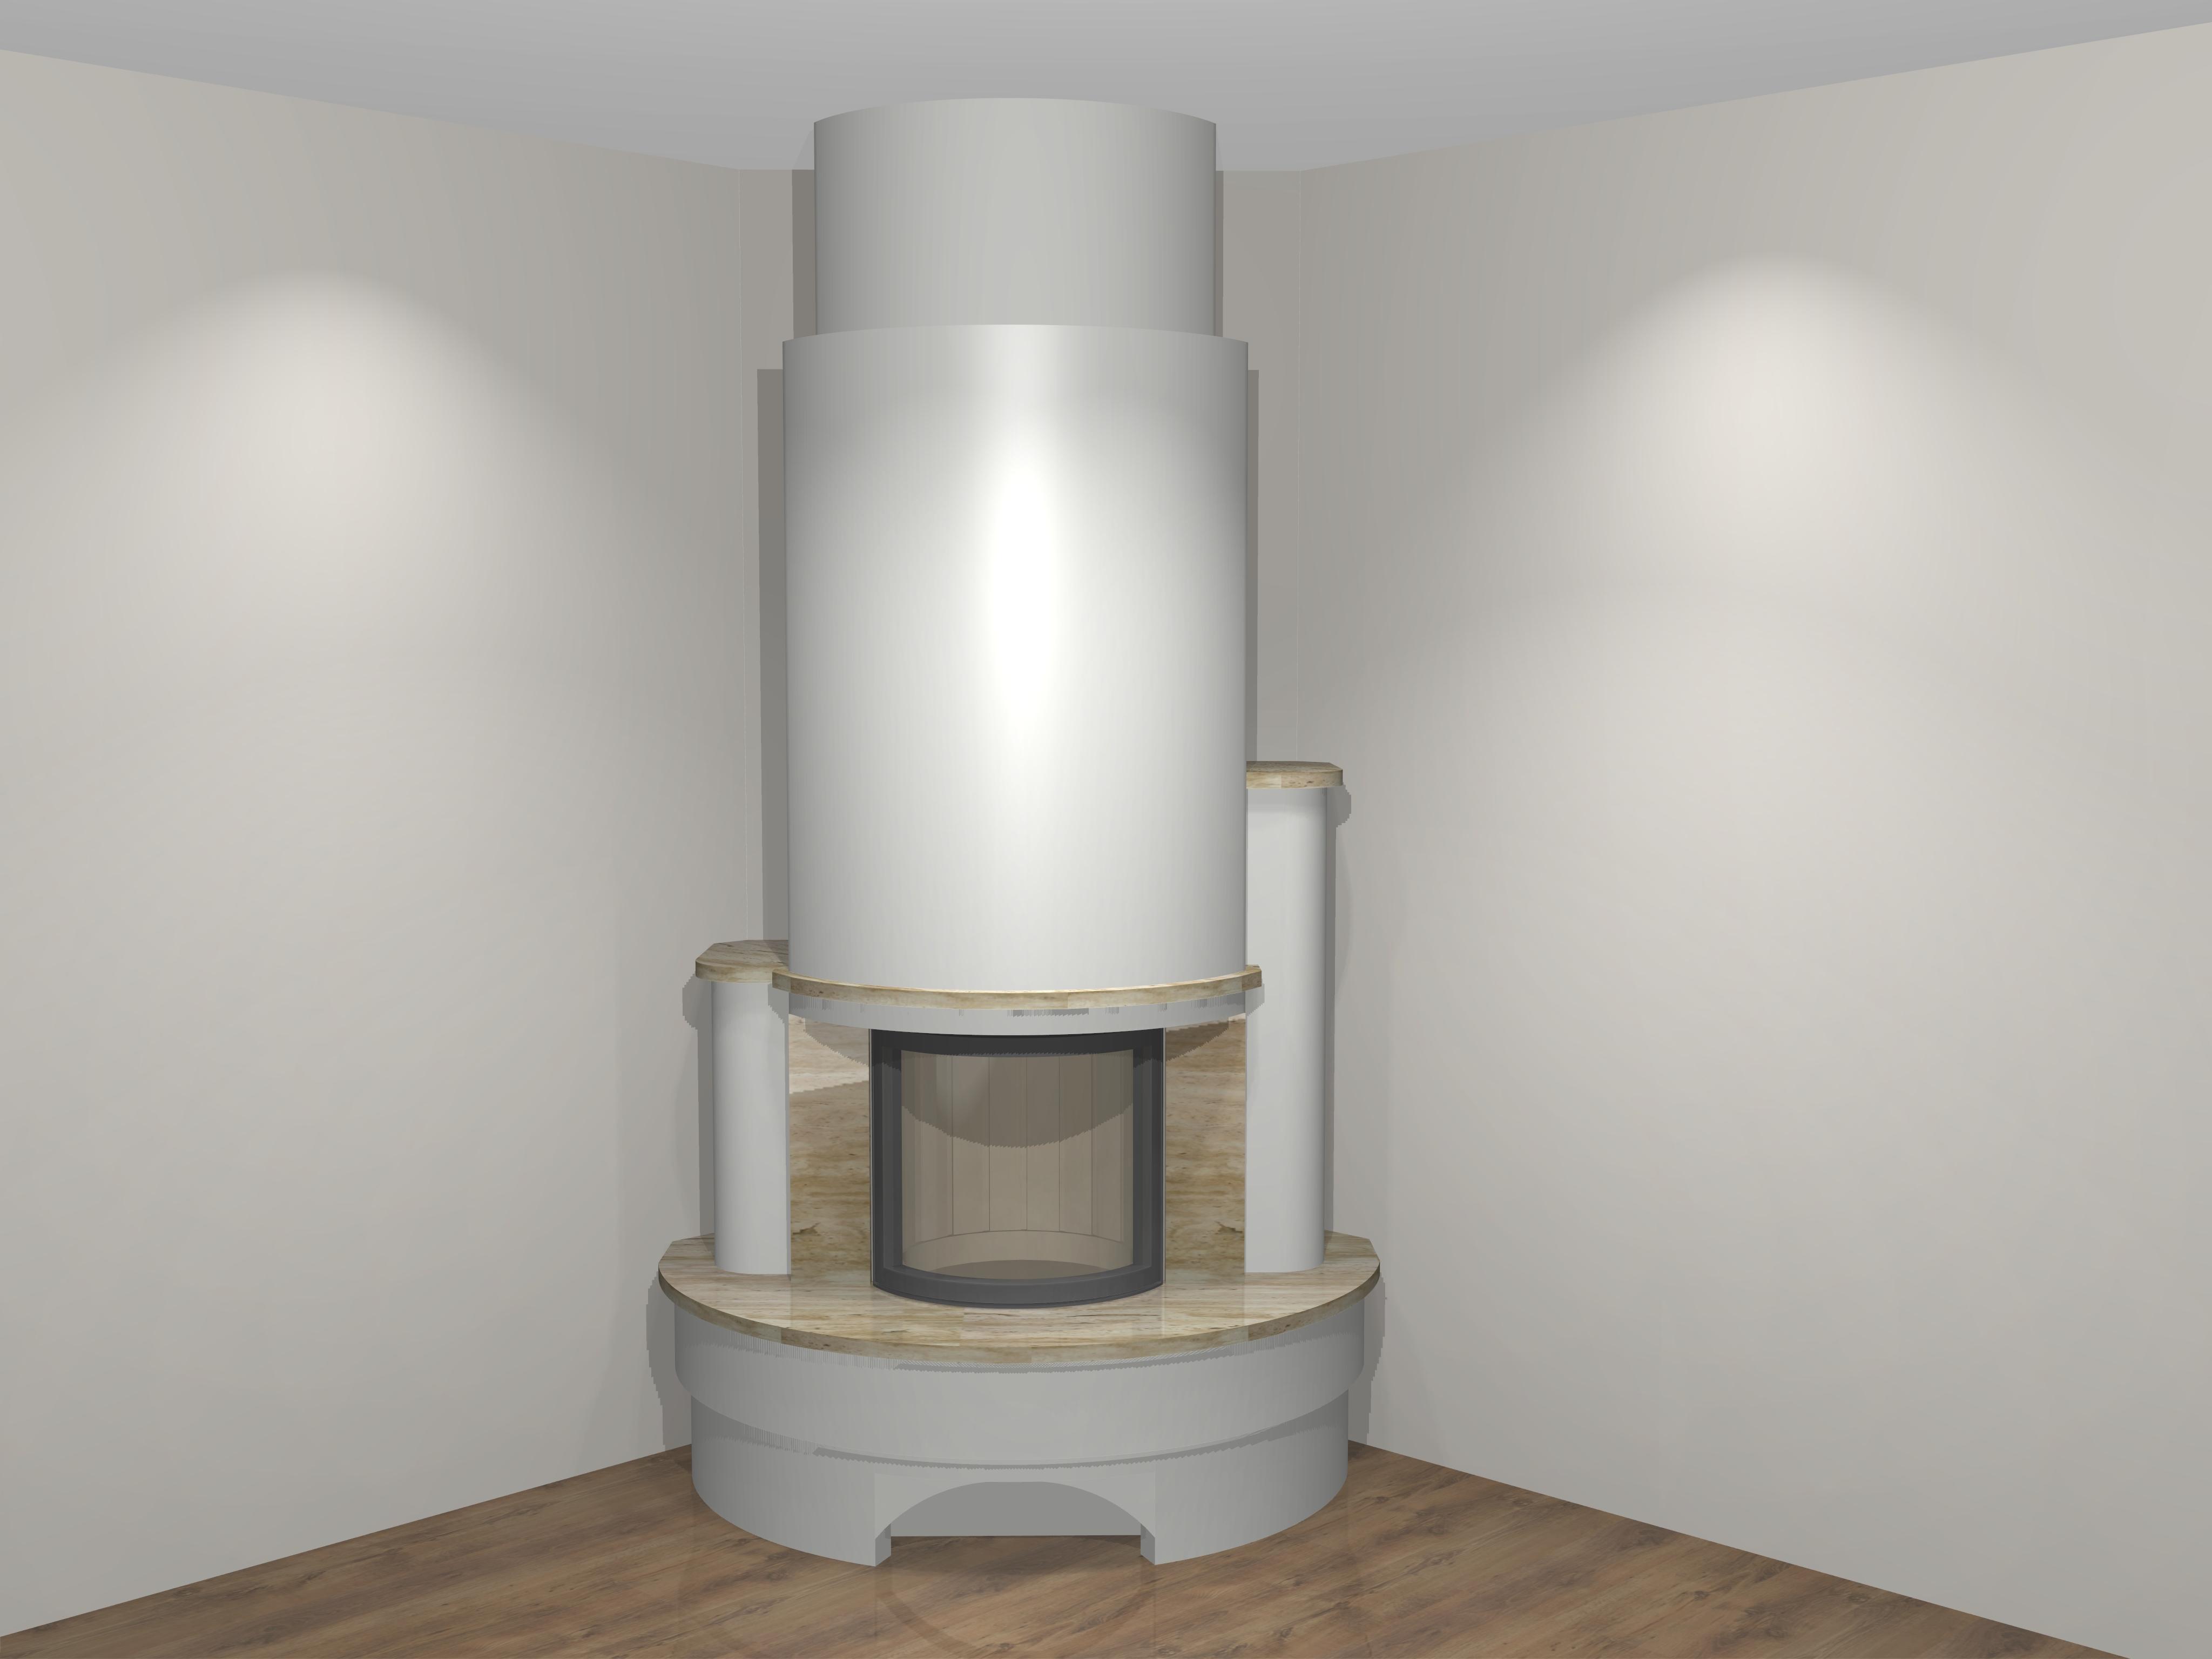 moderner kamin als rund a 08 1 mit montage. Black Bedroom Furniture Sets. Home Design Ideas